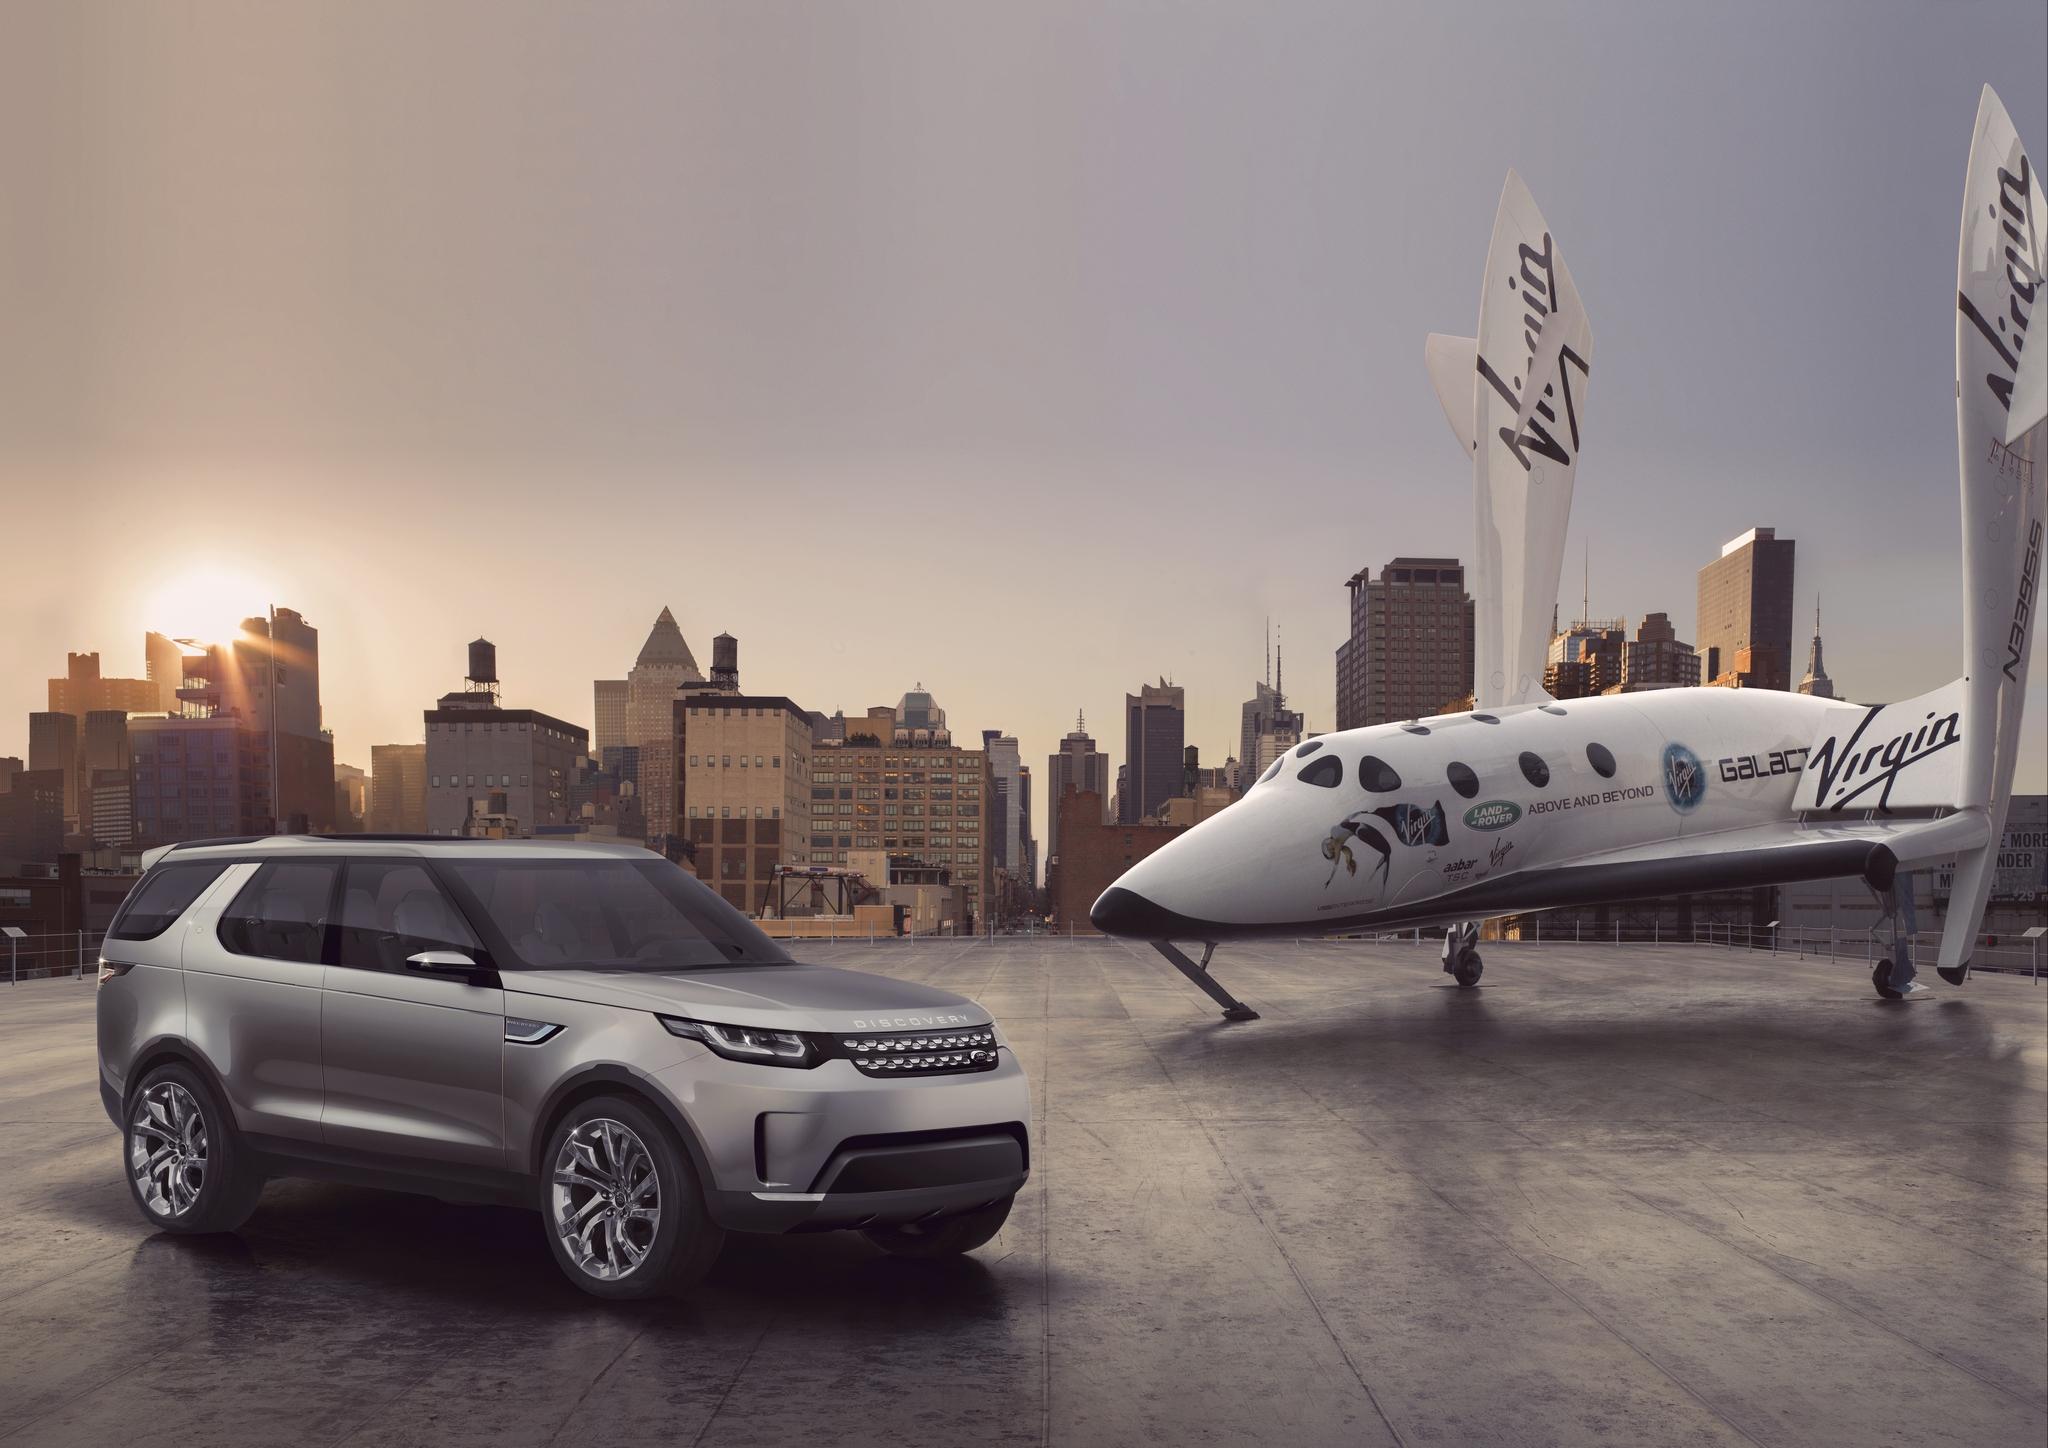 Land Rover enters Virgin Galactic partnership